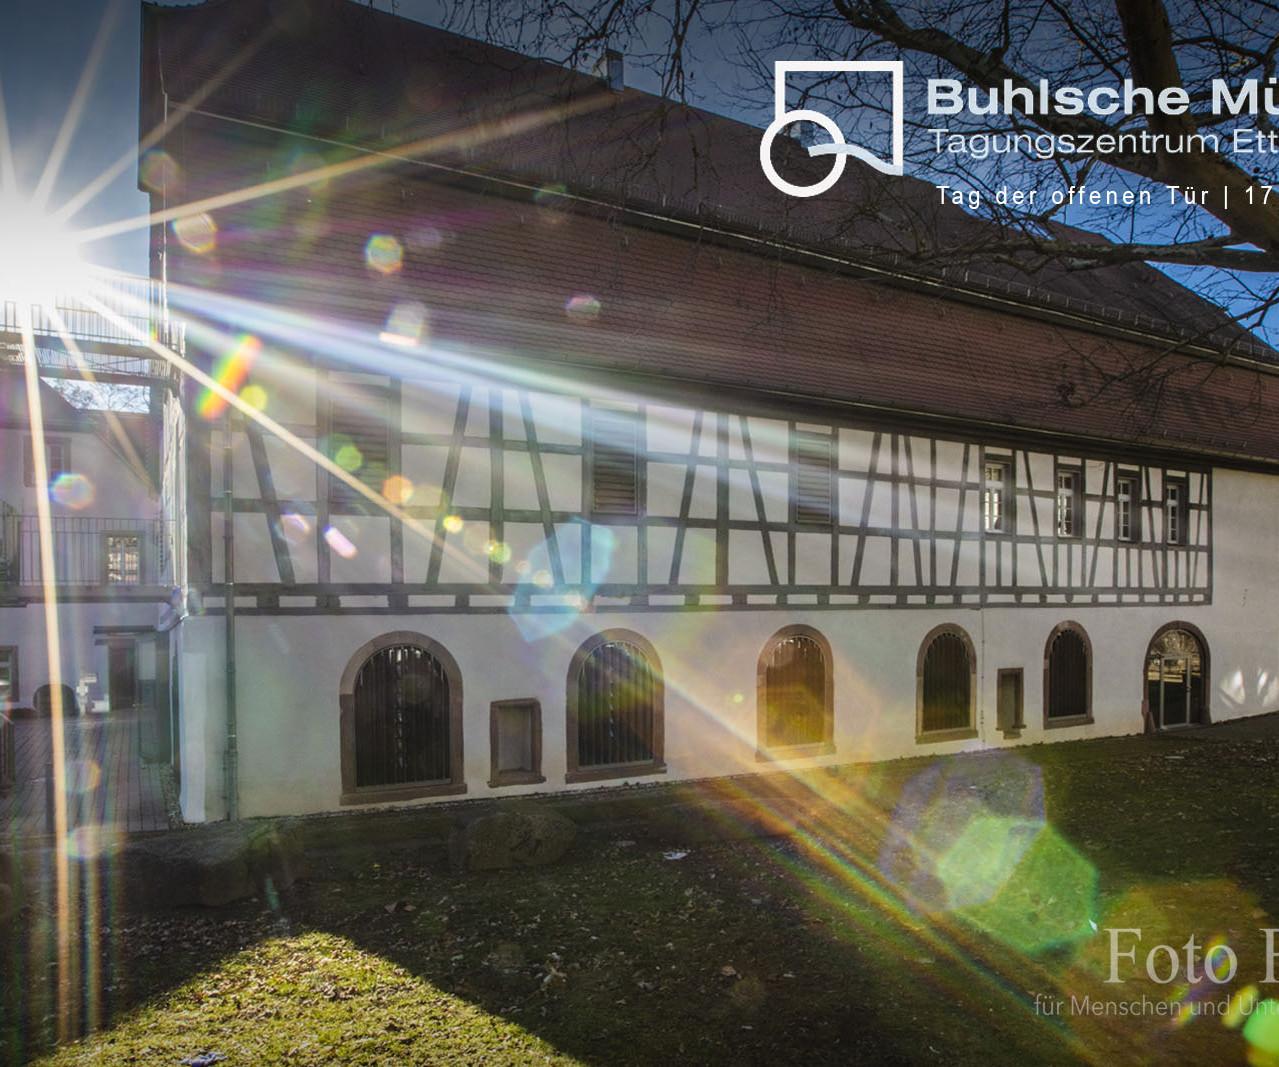 20190217_BuhlscheMühle_FB1